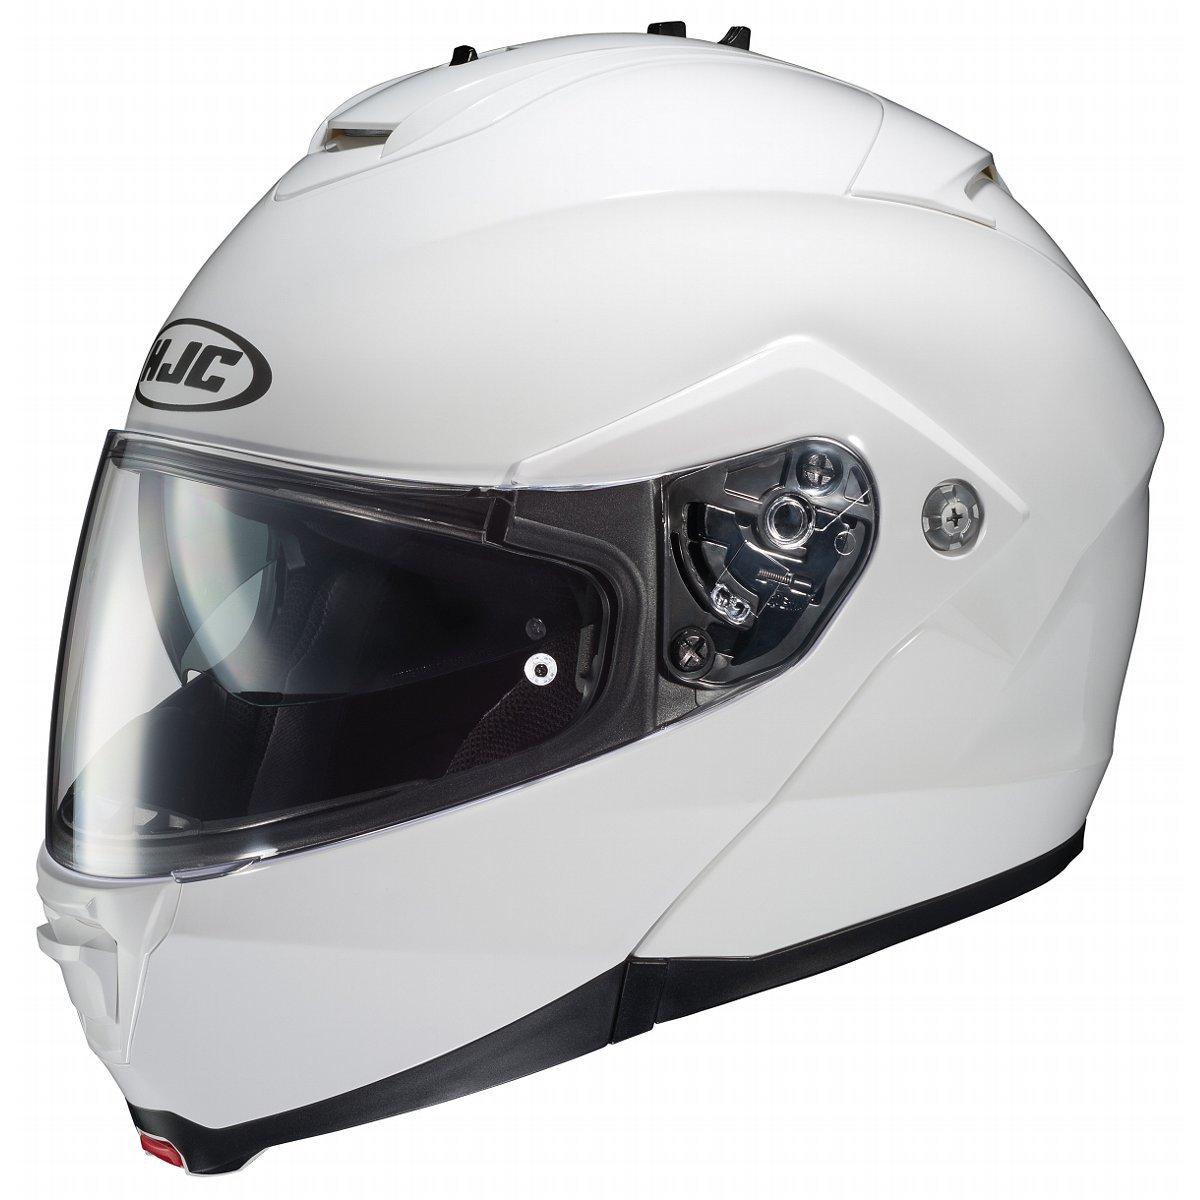 HJC IS-Max II White Modular Helmet - 2X-Large